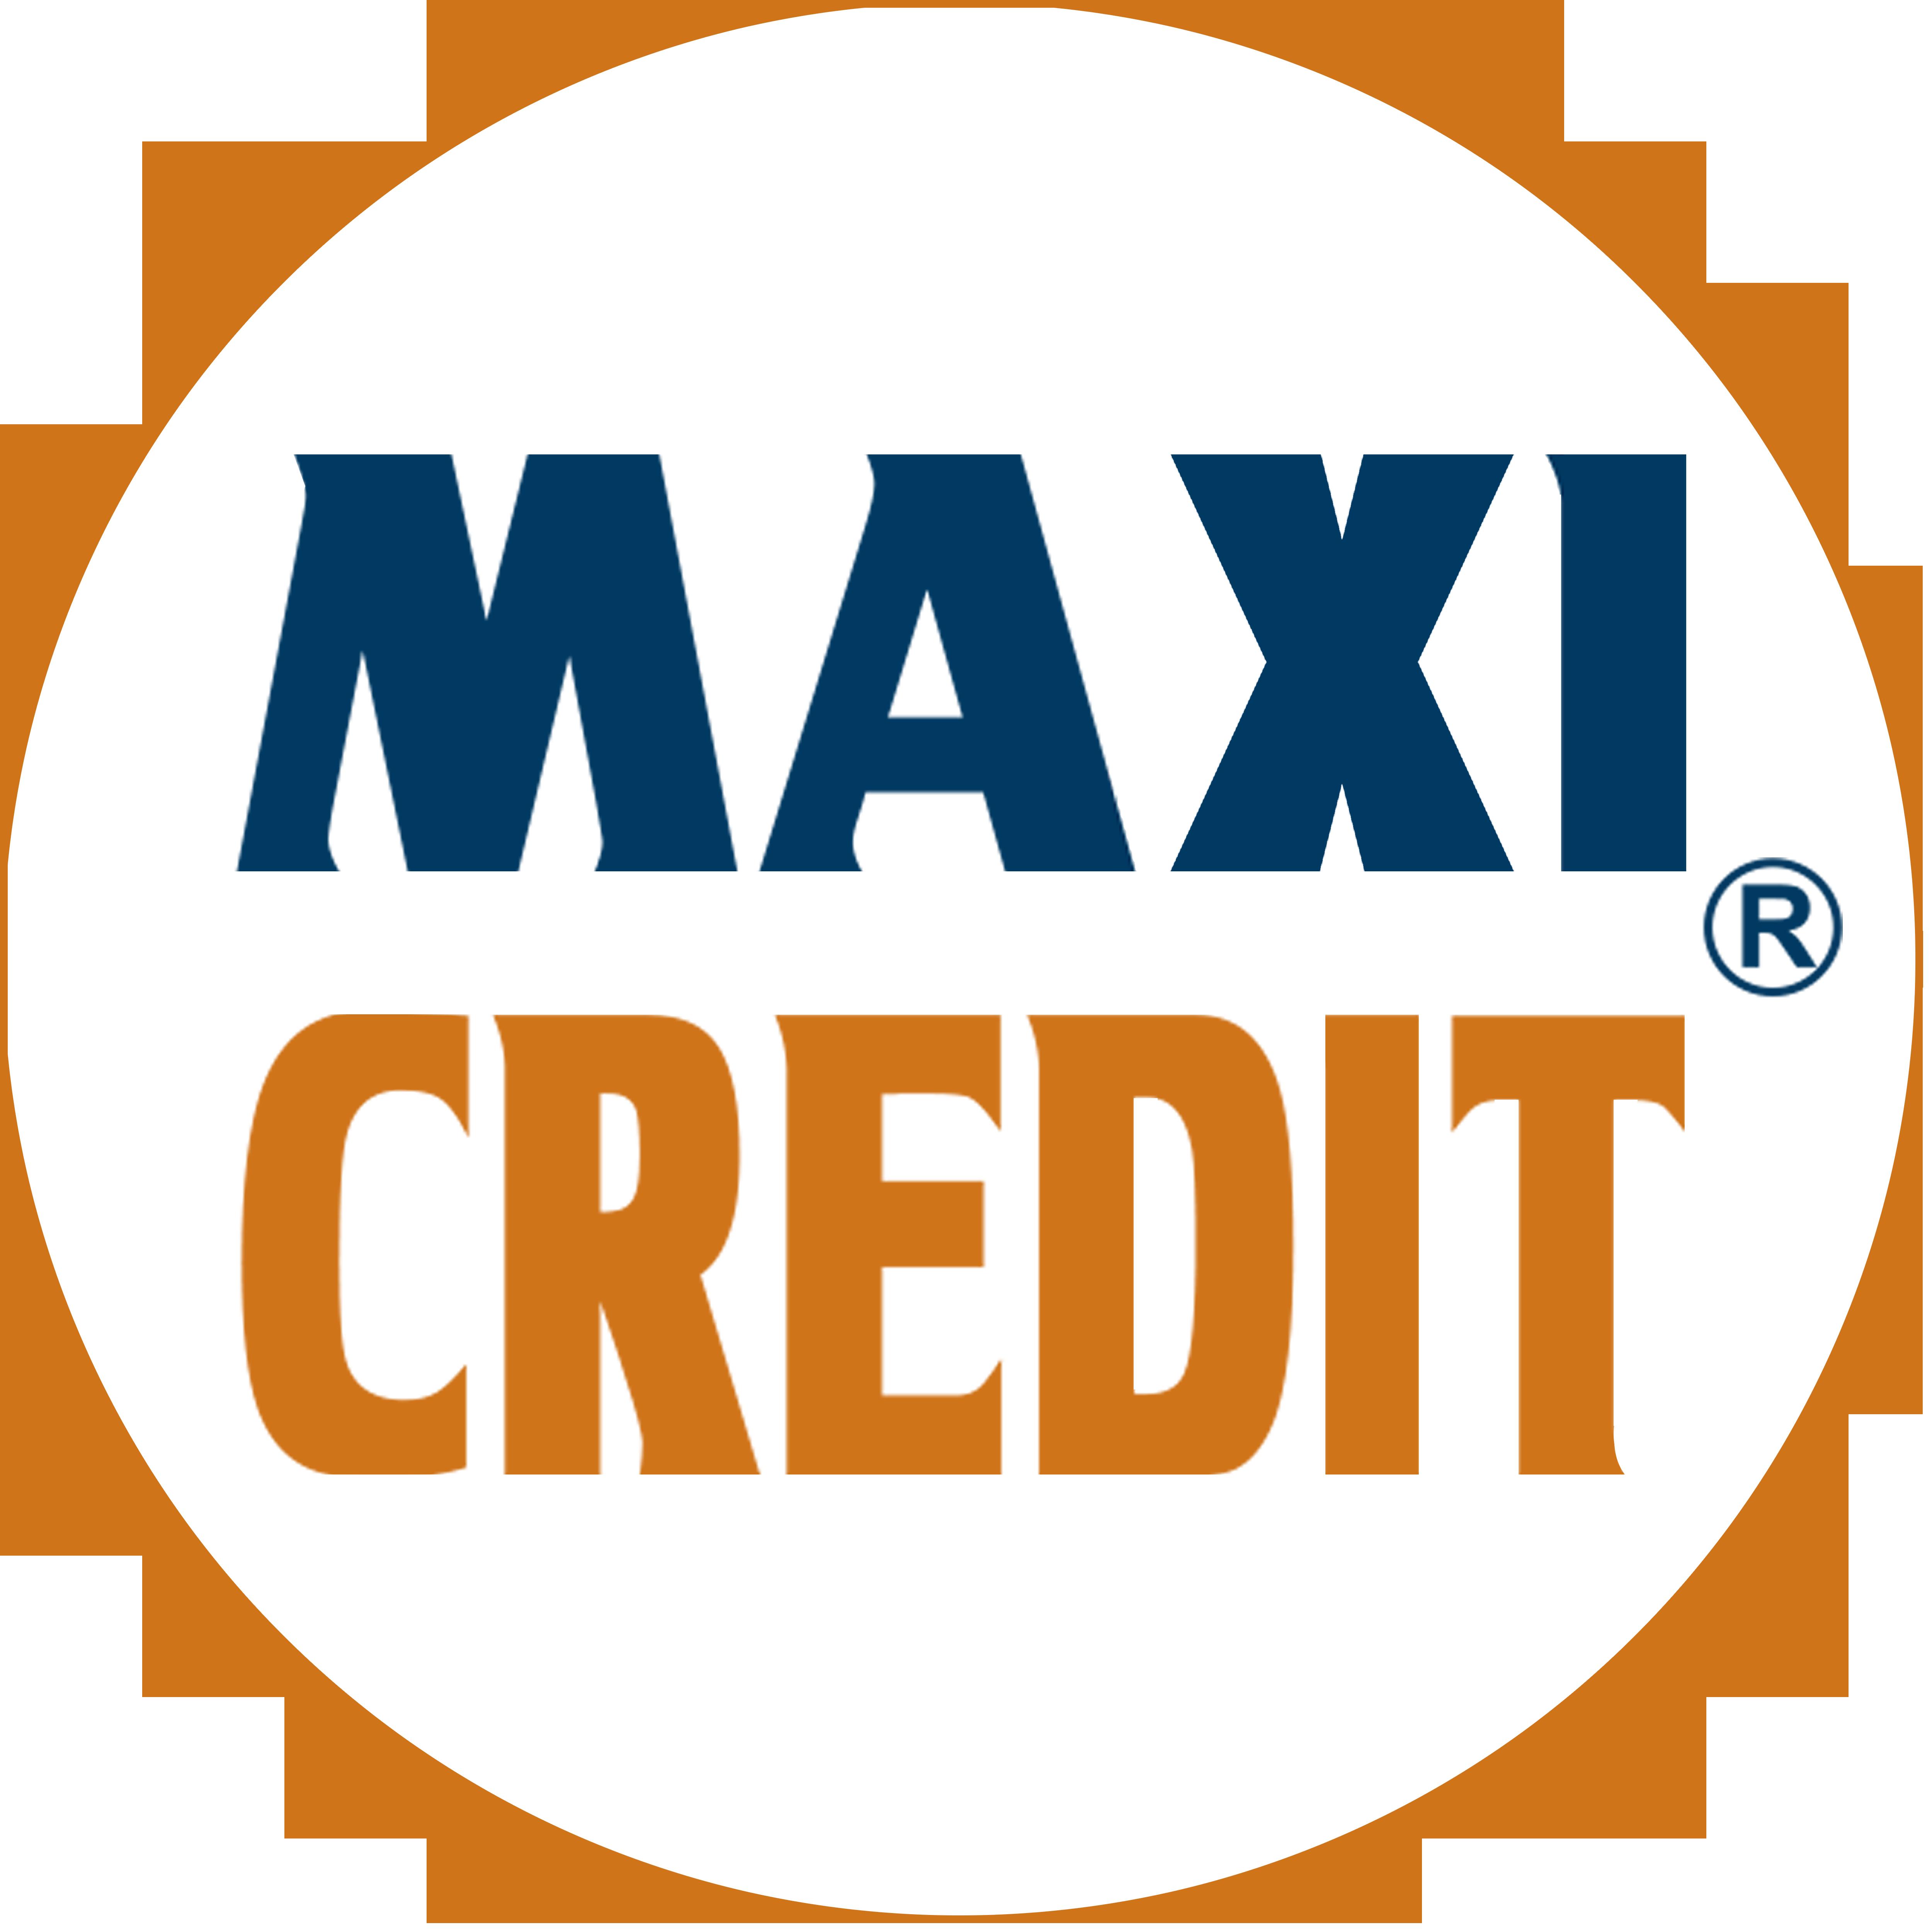 Maxicredit